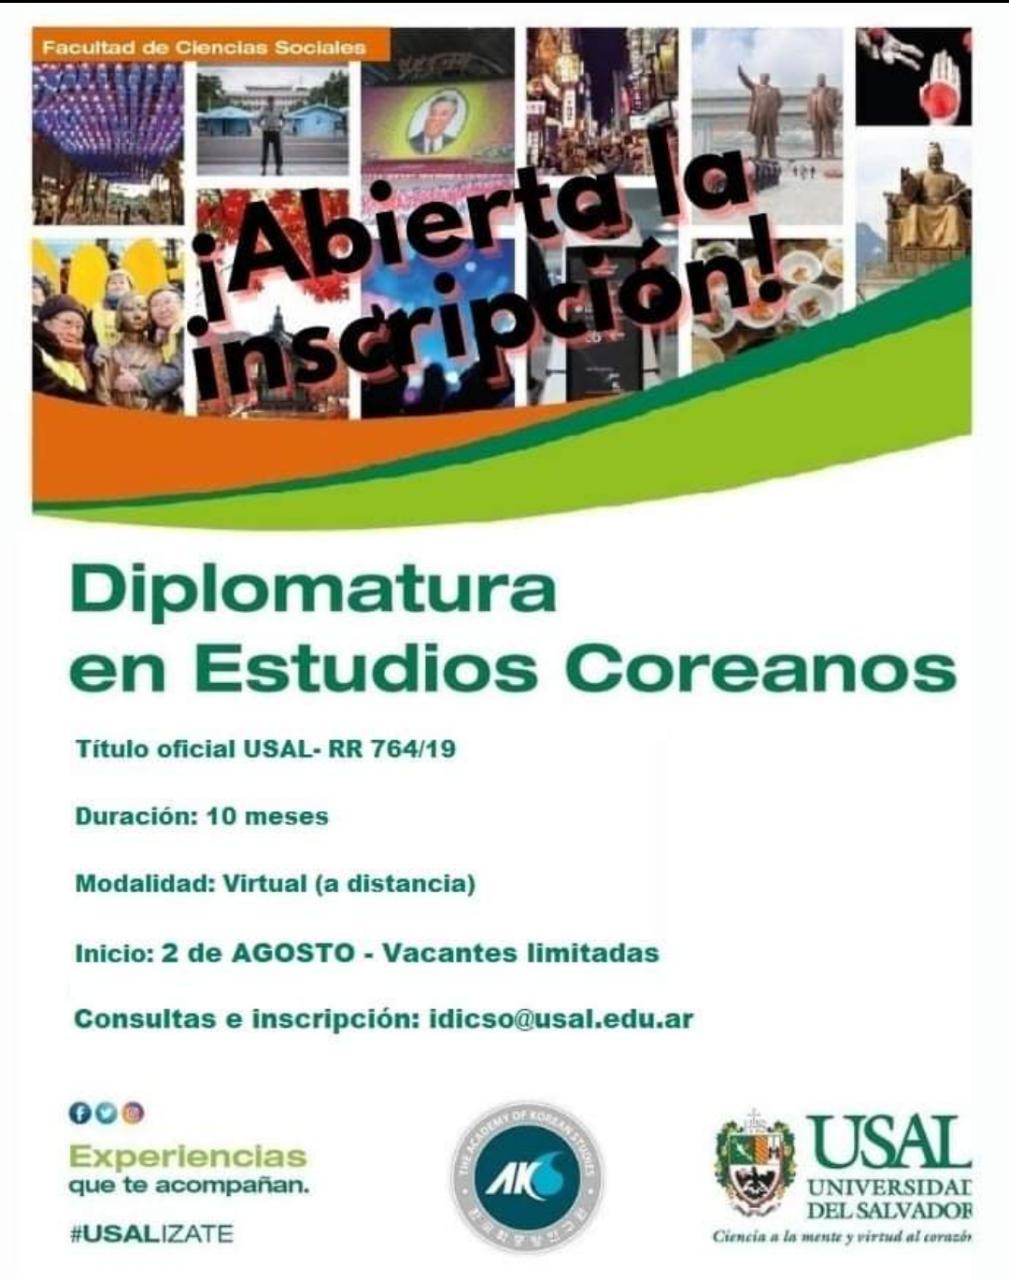 Diplomatura de Estudios Coreanos.jpg